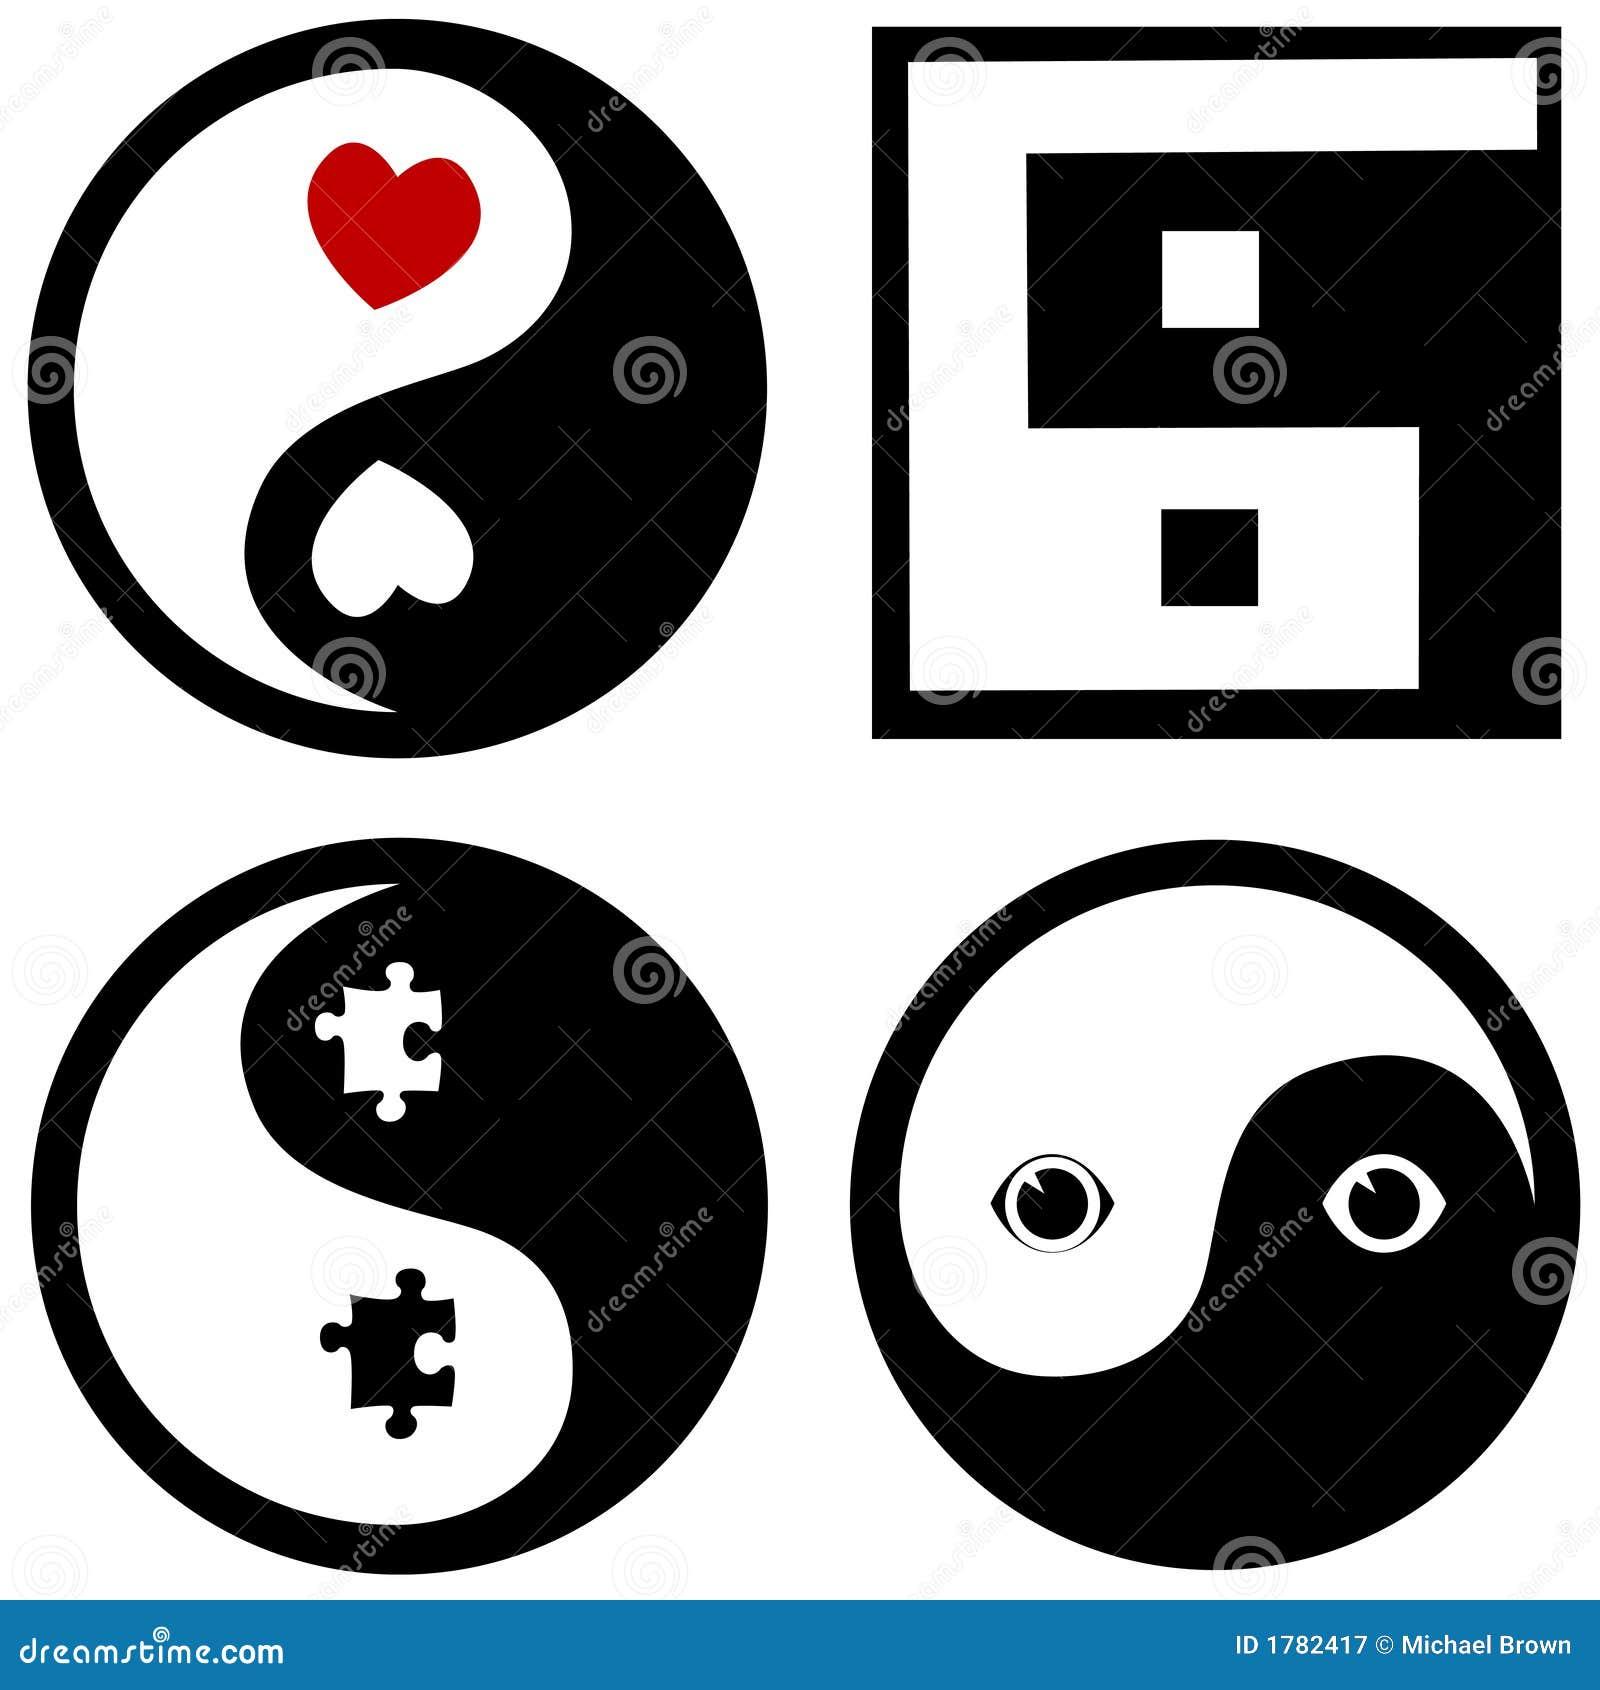 Conceptual Yinyang Symbols Stock Vector Illustration Of Balance